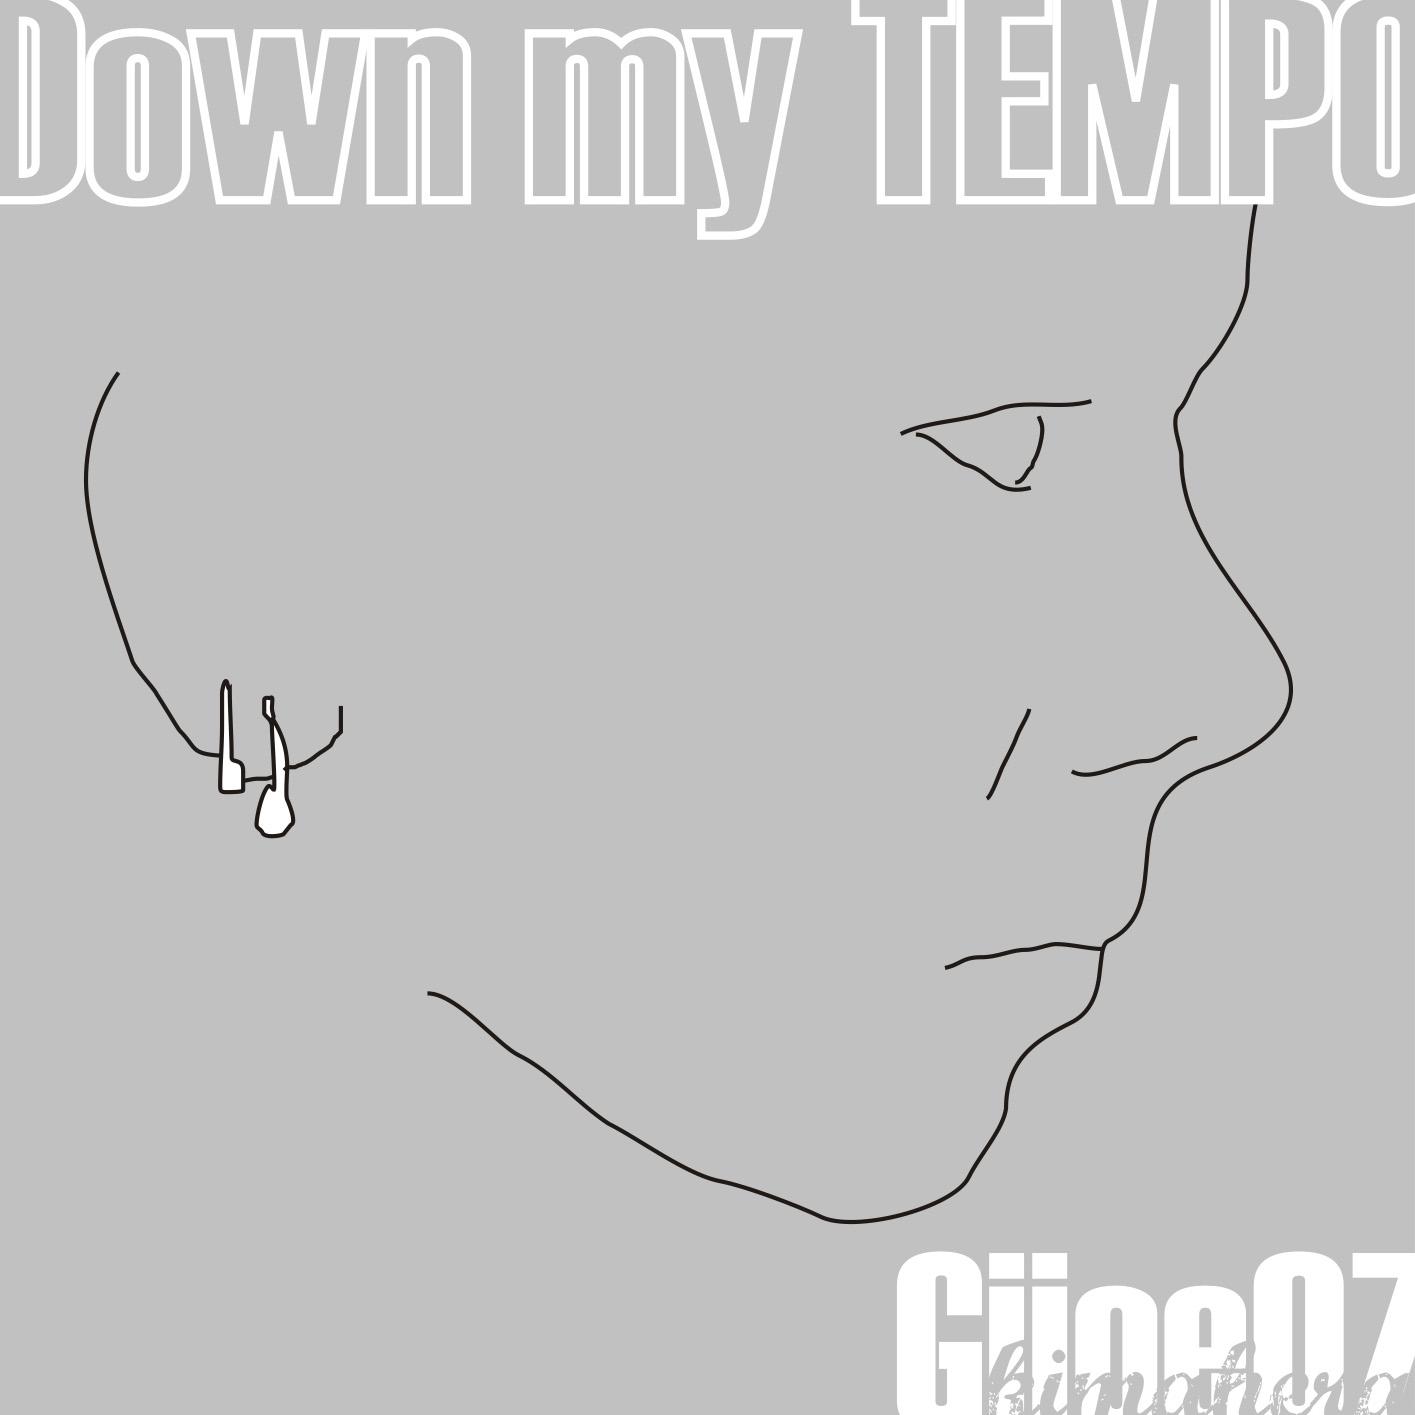 Down my tempo